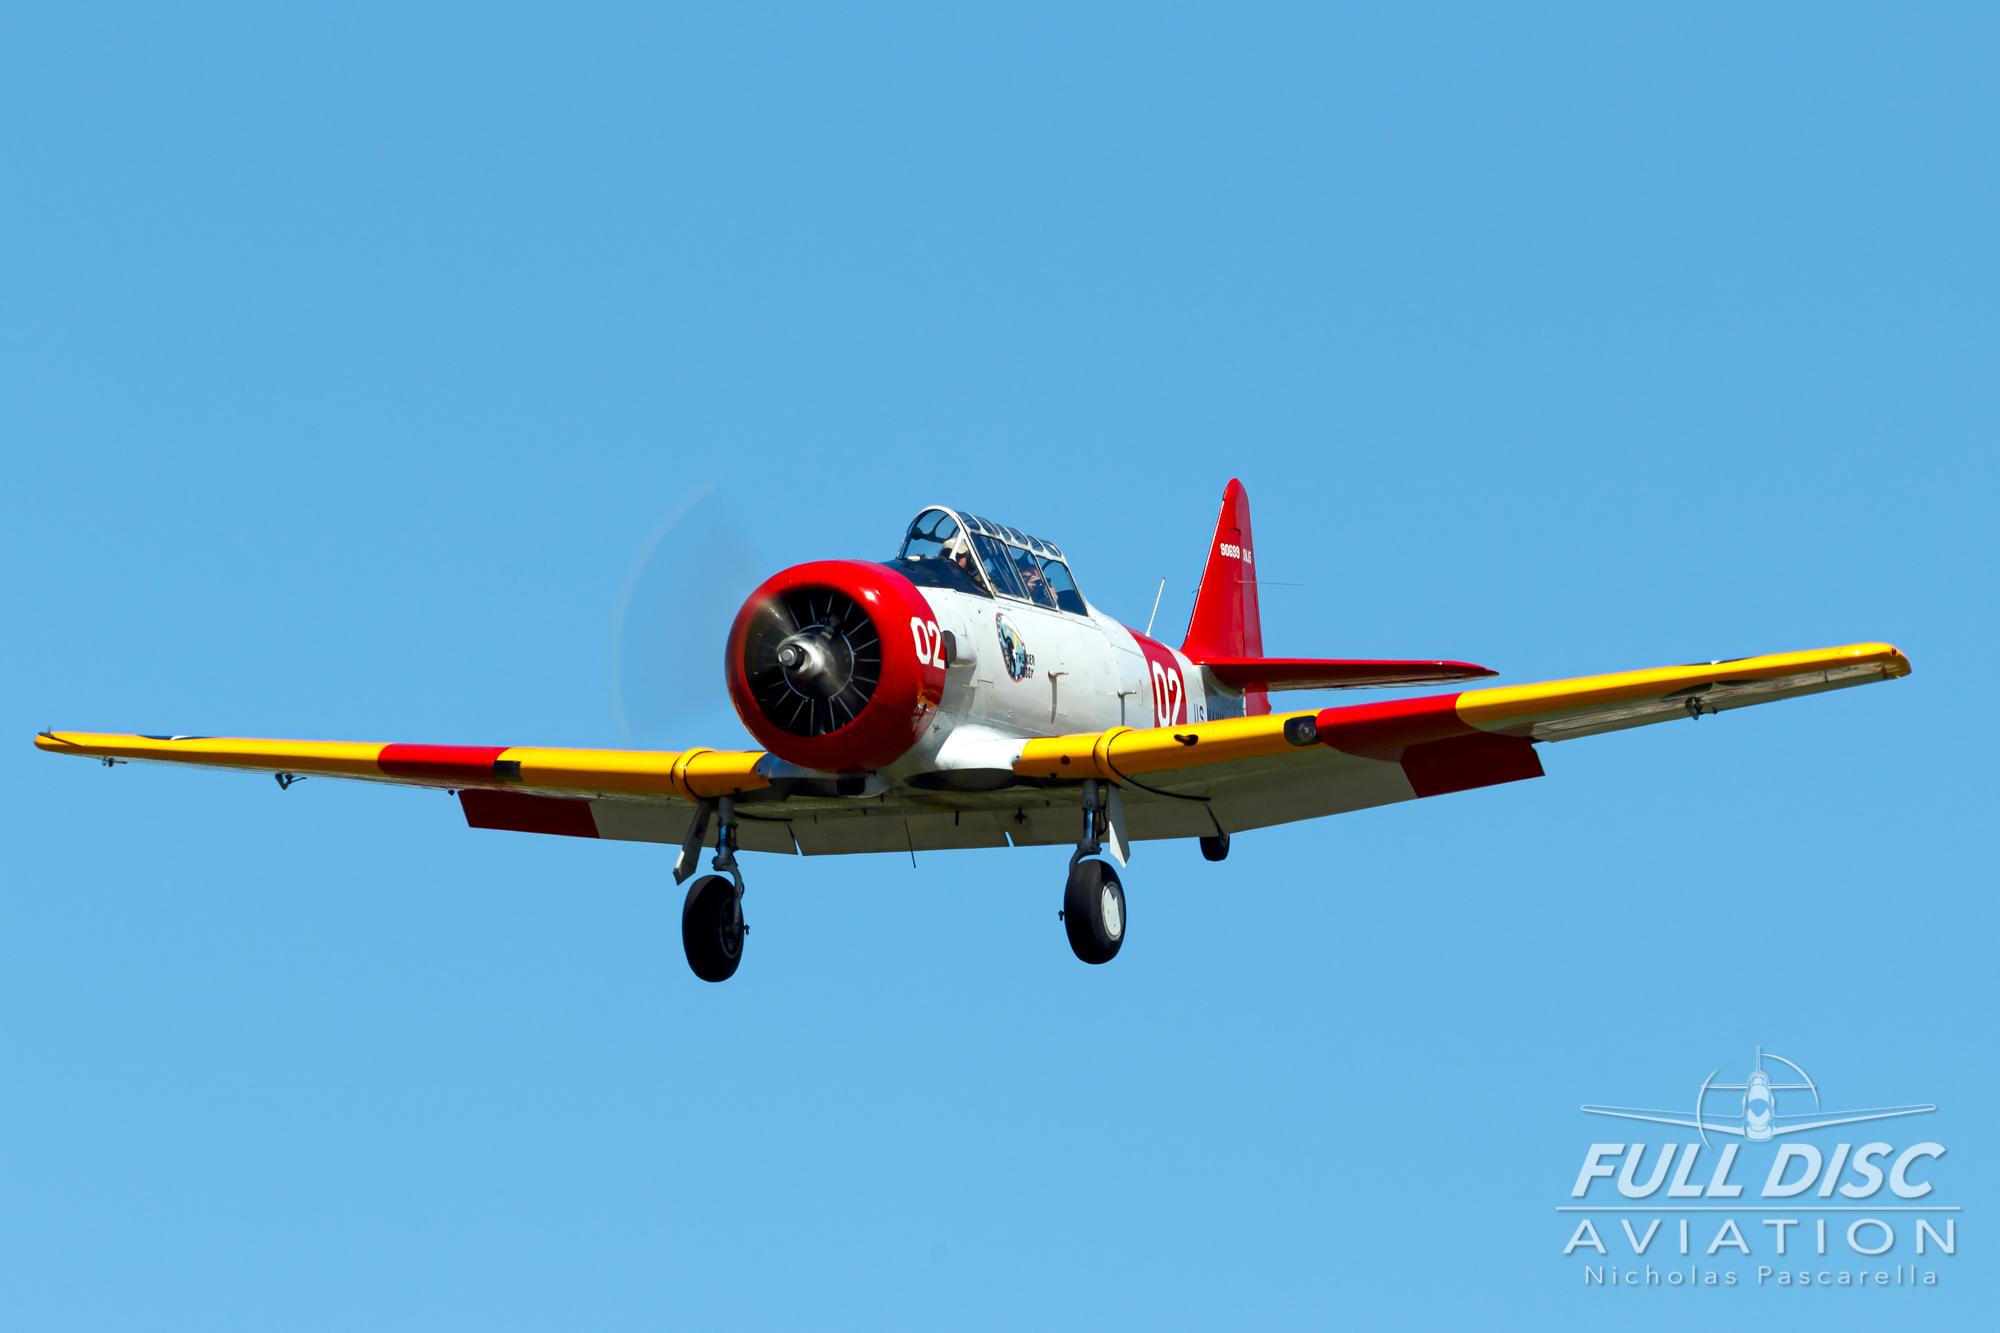 americanairpowermuseum_nicholaspascarella_nickpascarella_fulldiscaviation_legendsofairpower2019_aviation_warbird_t6_texan_thunderpussy_landing.jpg